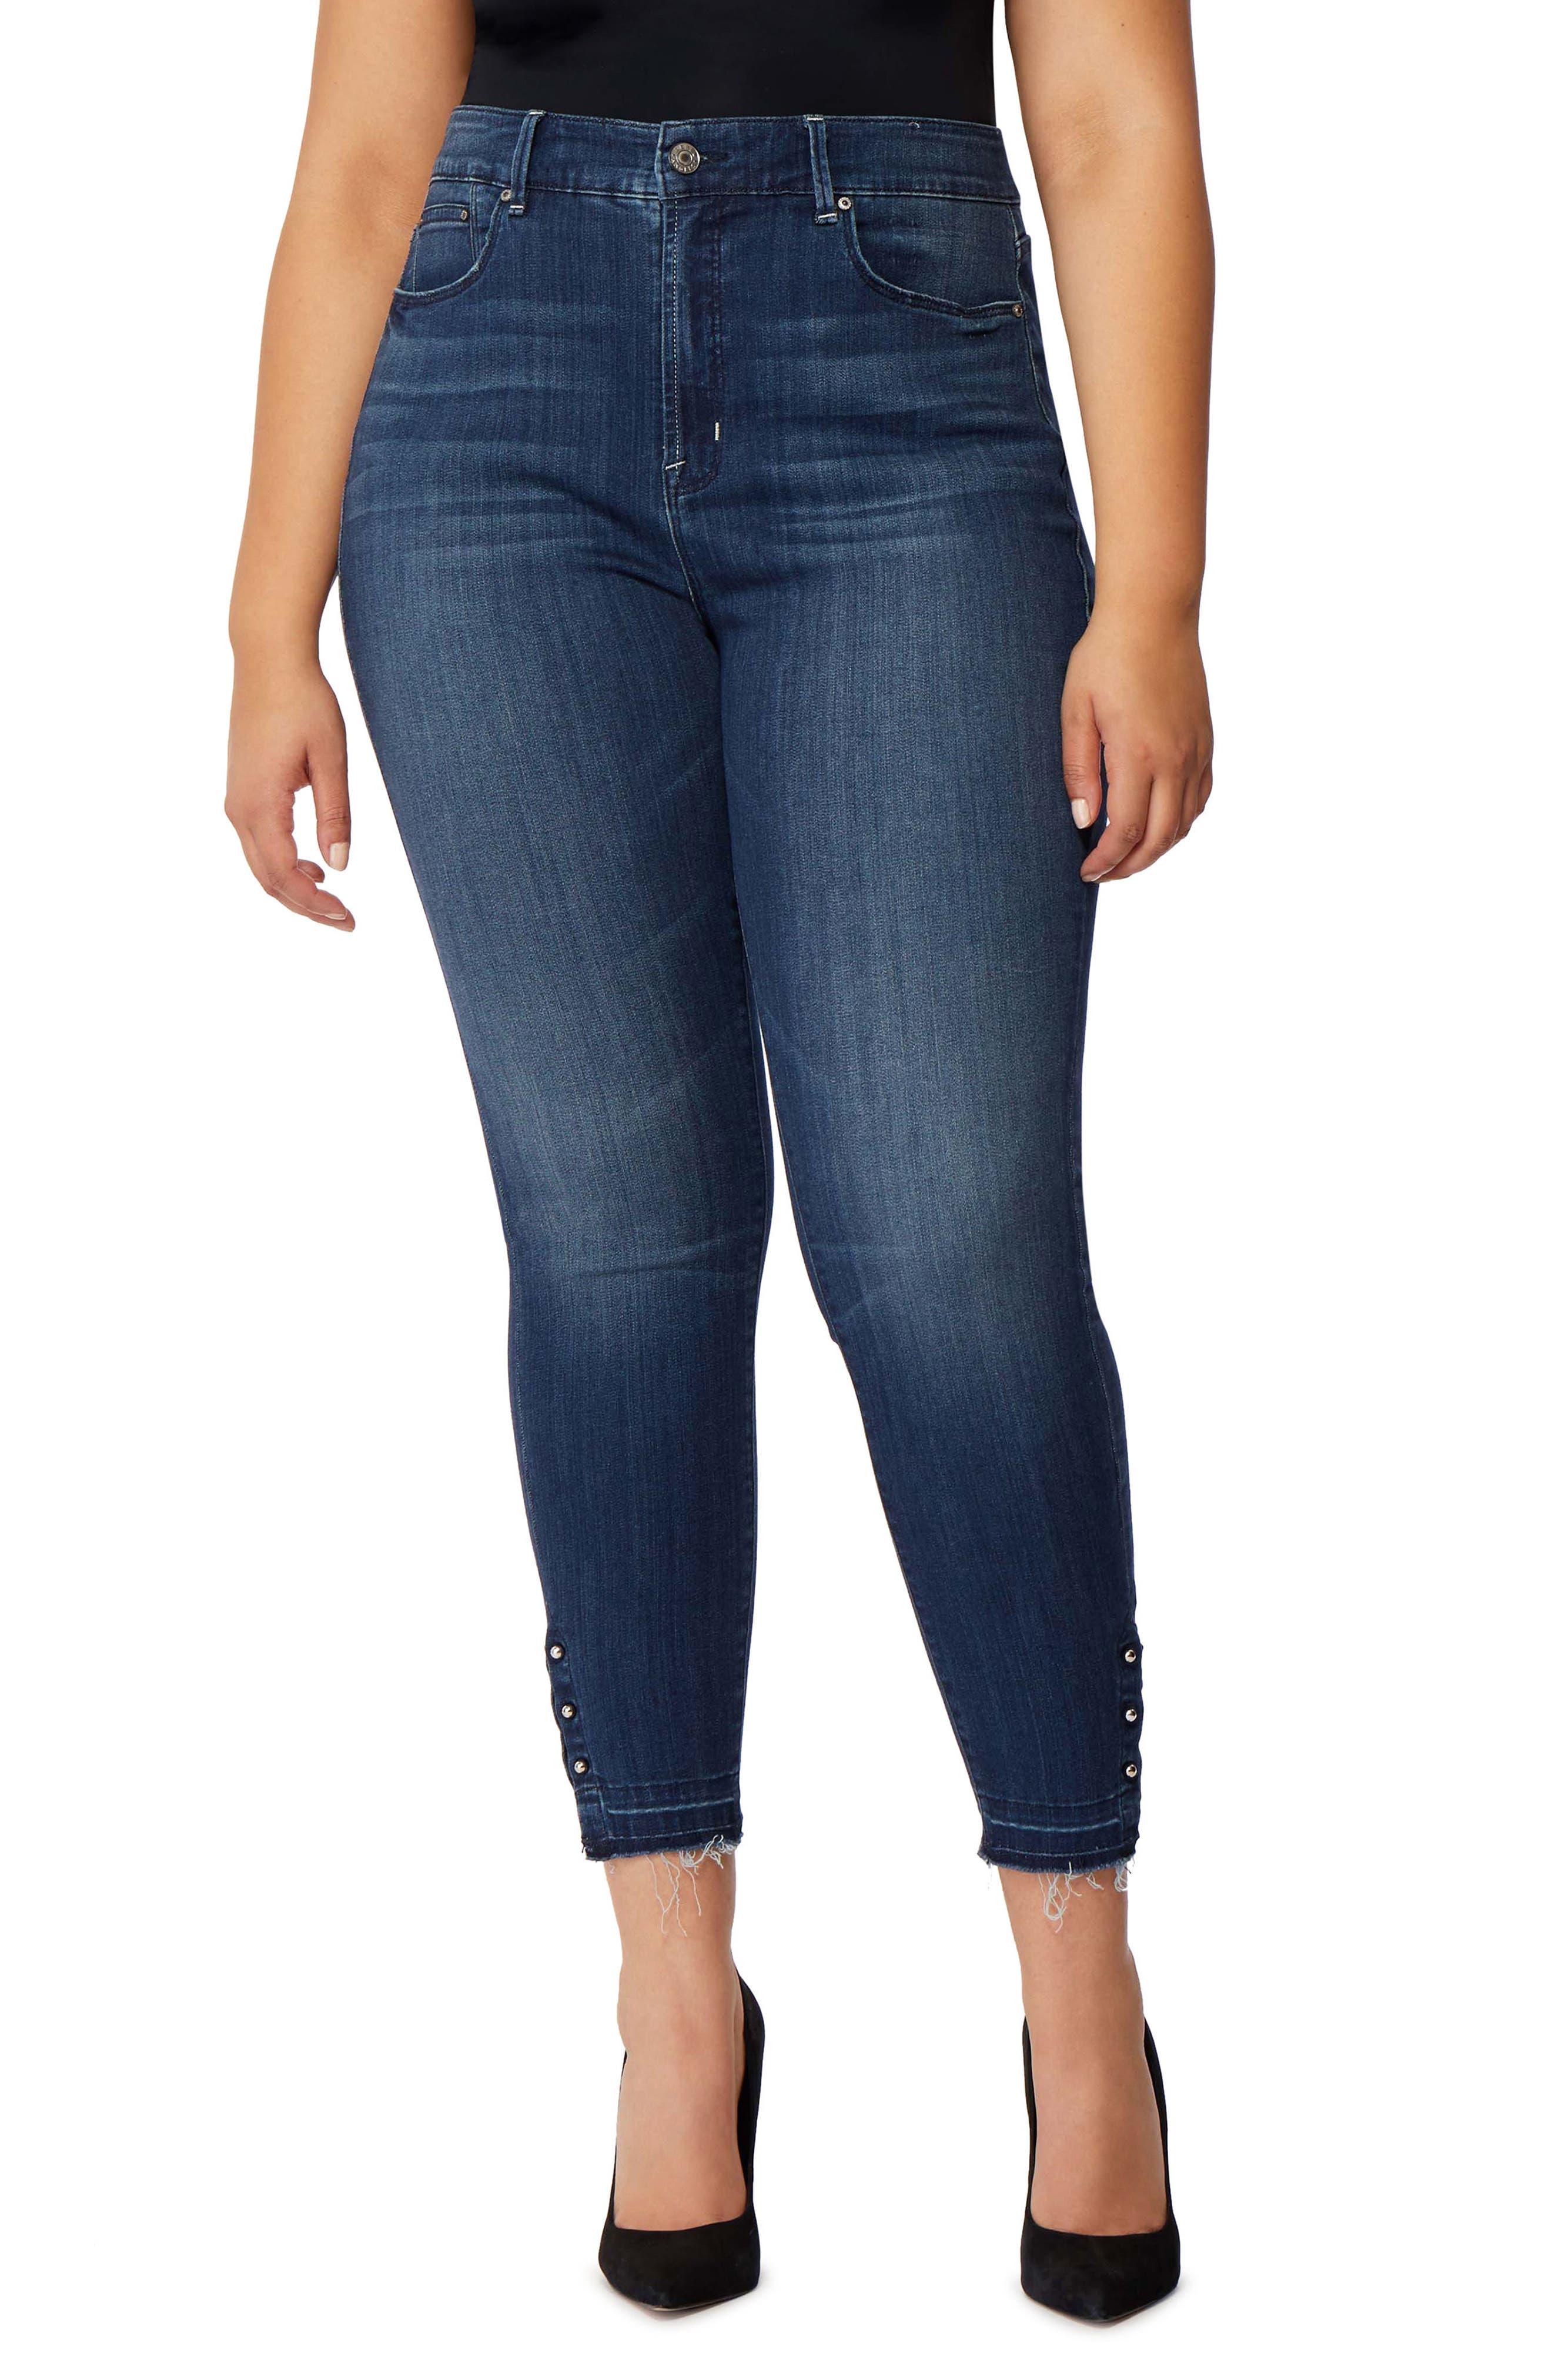 Rebel Wilson The Vamp Crop High Waist Skinny Jeans (Plus Size)